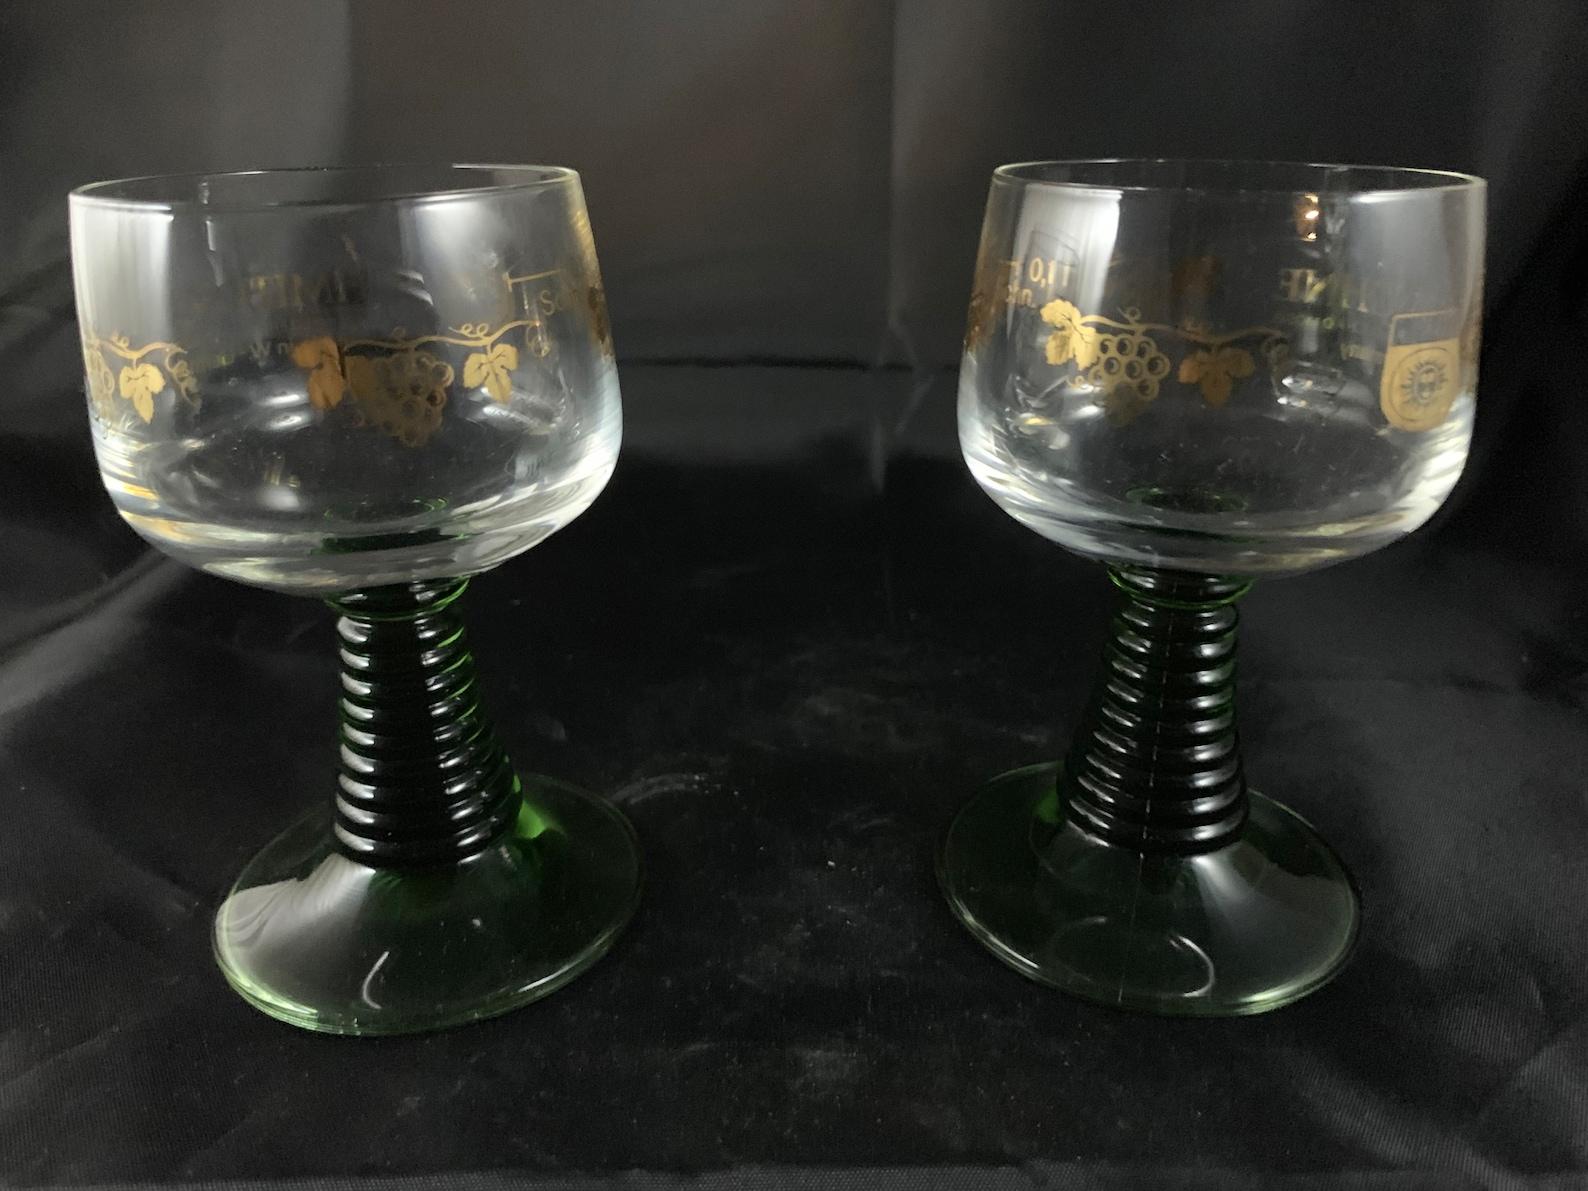 West German Schmitt Sohne Roemer Rhine Wine (2) Glasses Set 4.5